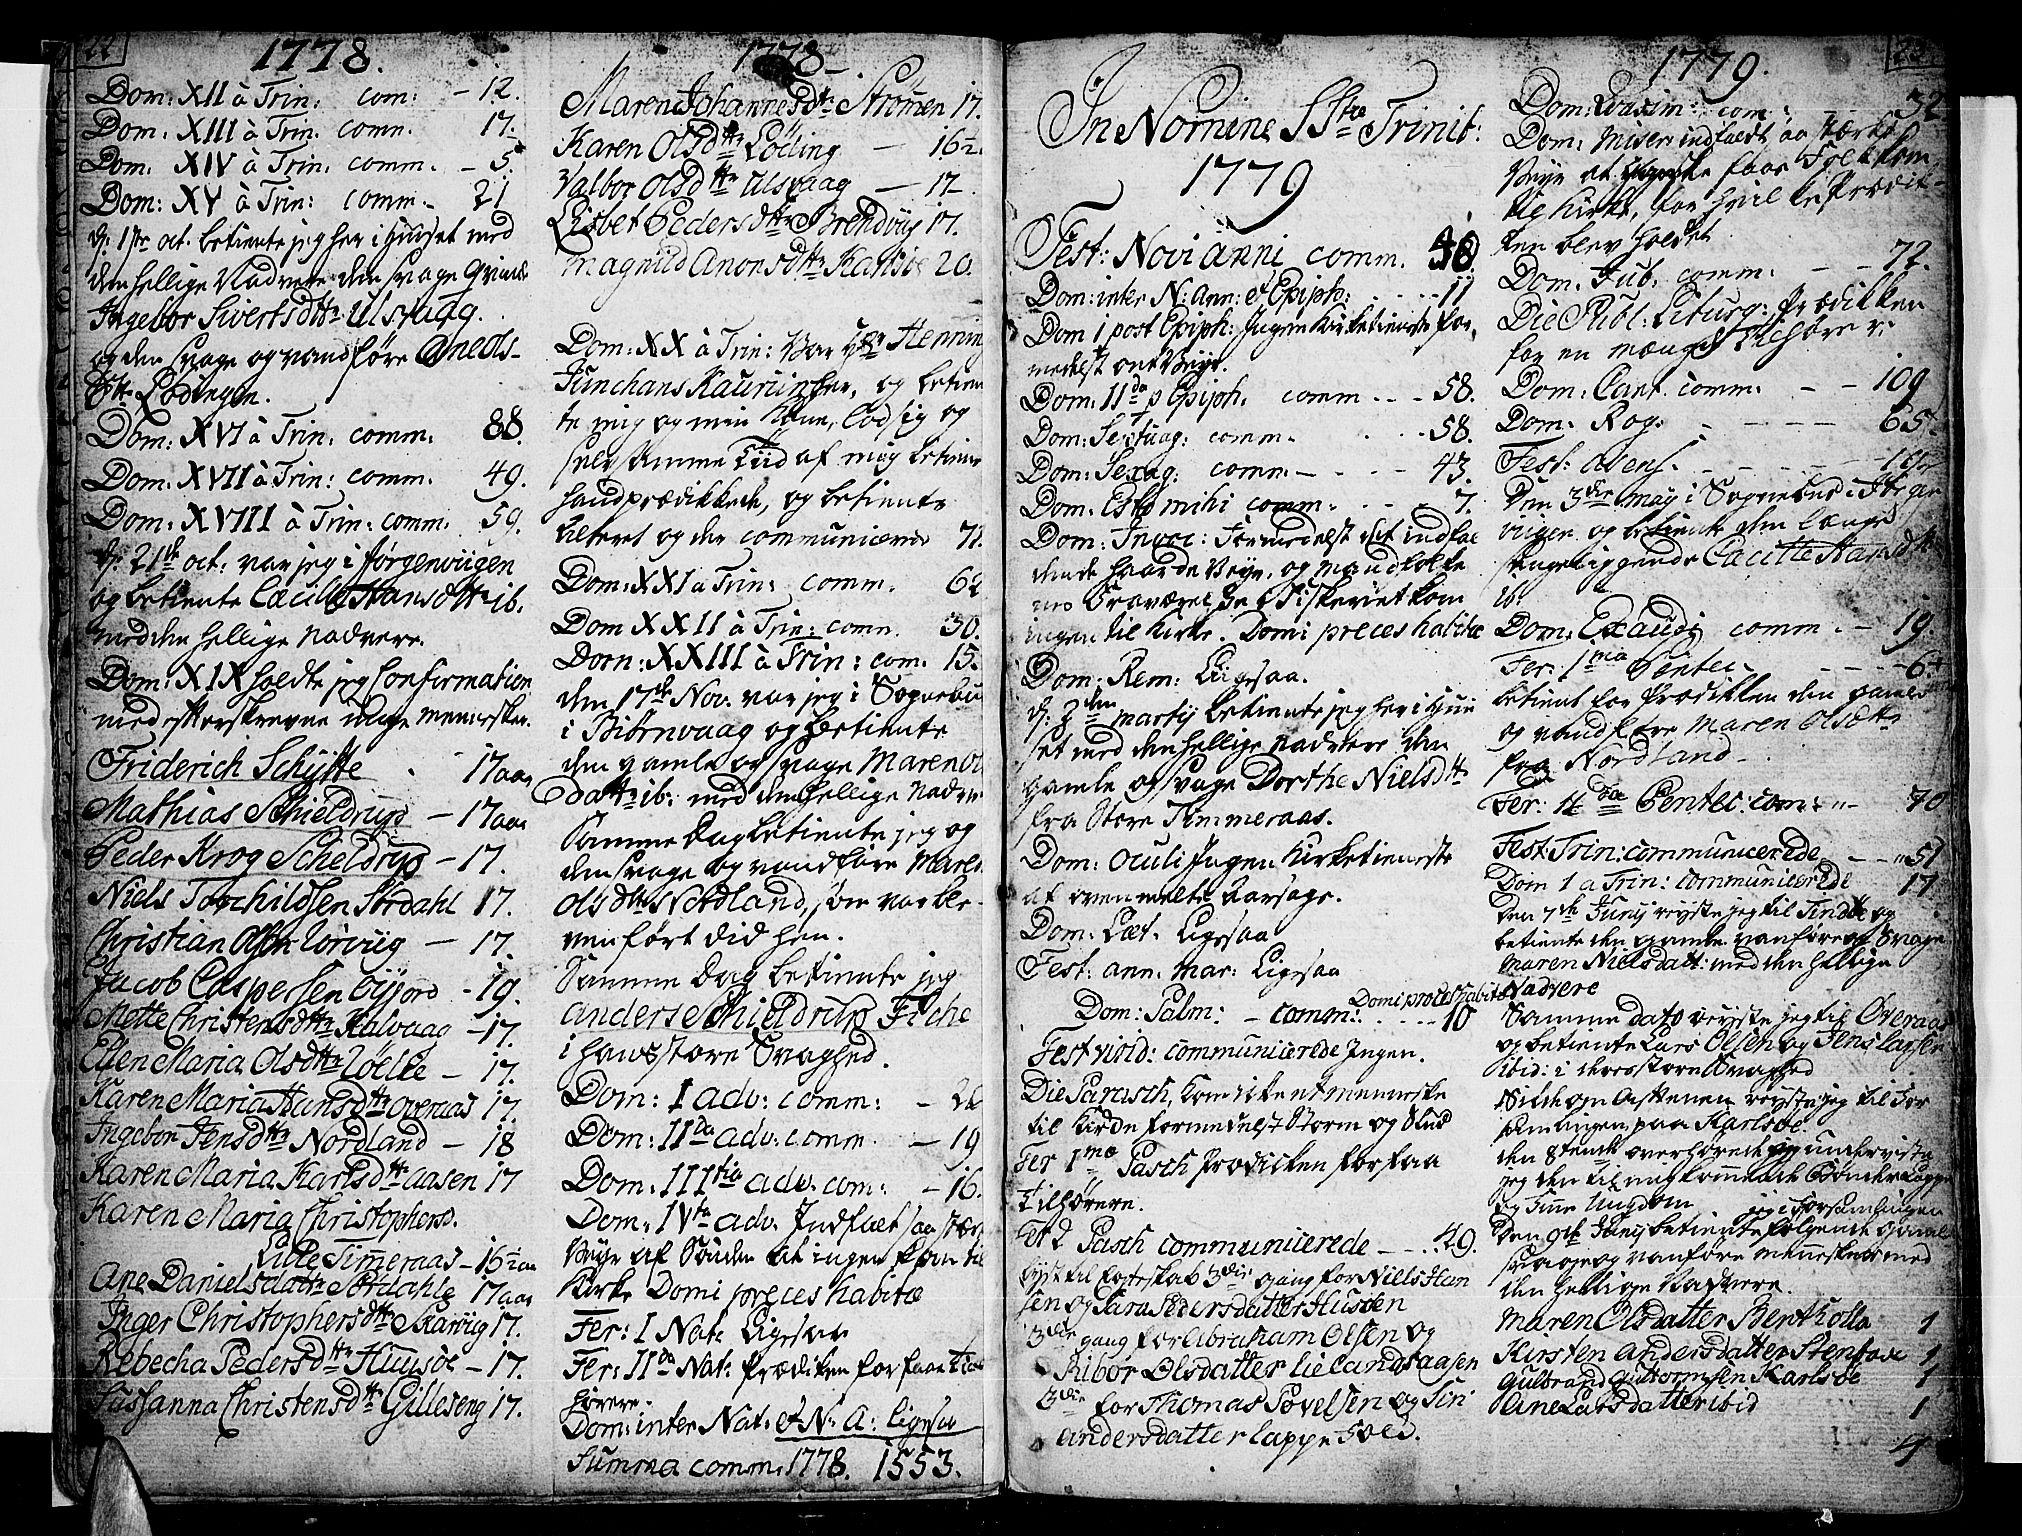 SAT, Ministerialprotokoller, klokkerbøker og fødselsregistre - Nordland, 859/L0841: Ministerialbok nr. 859A01, 1766-1821, s. 22-23